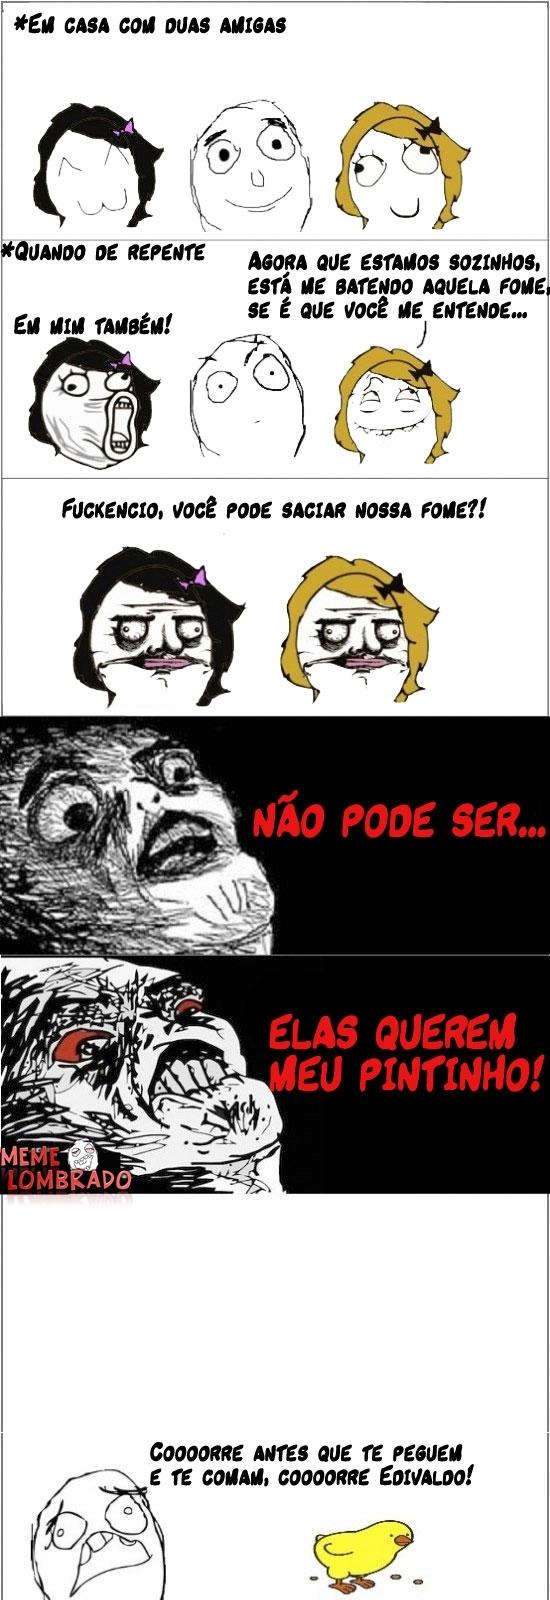 COOOORRE EDIVALDO ! - meme